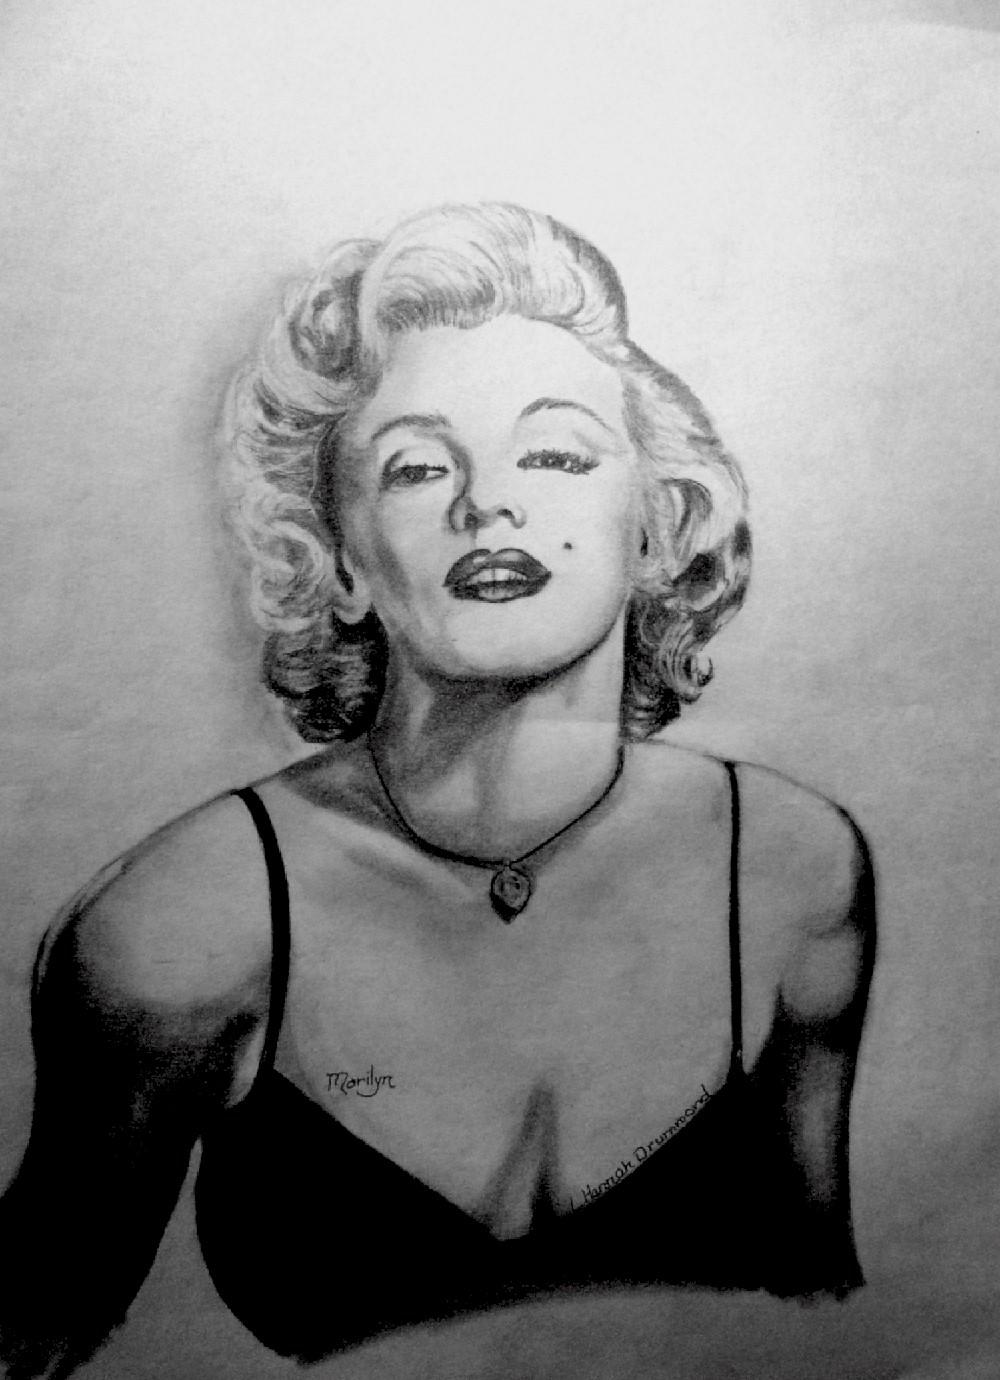 Marilyn Munroe Portrait